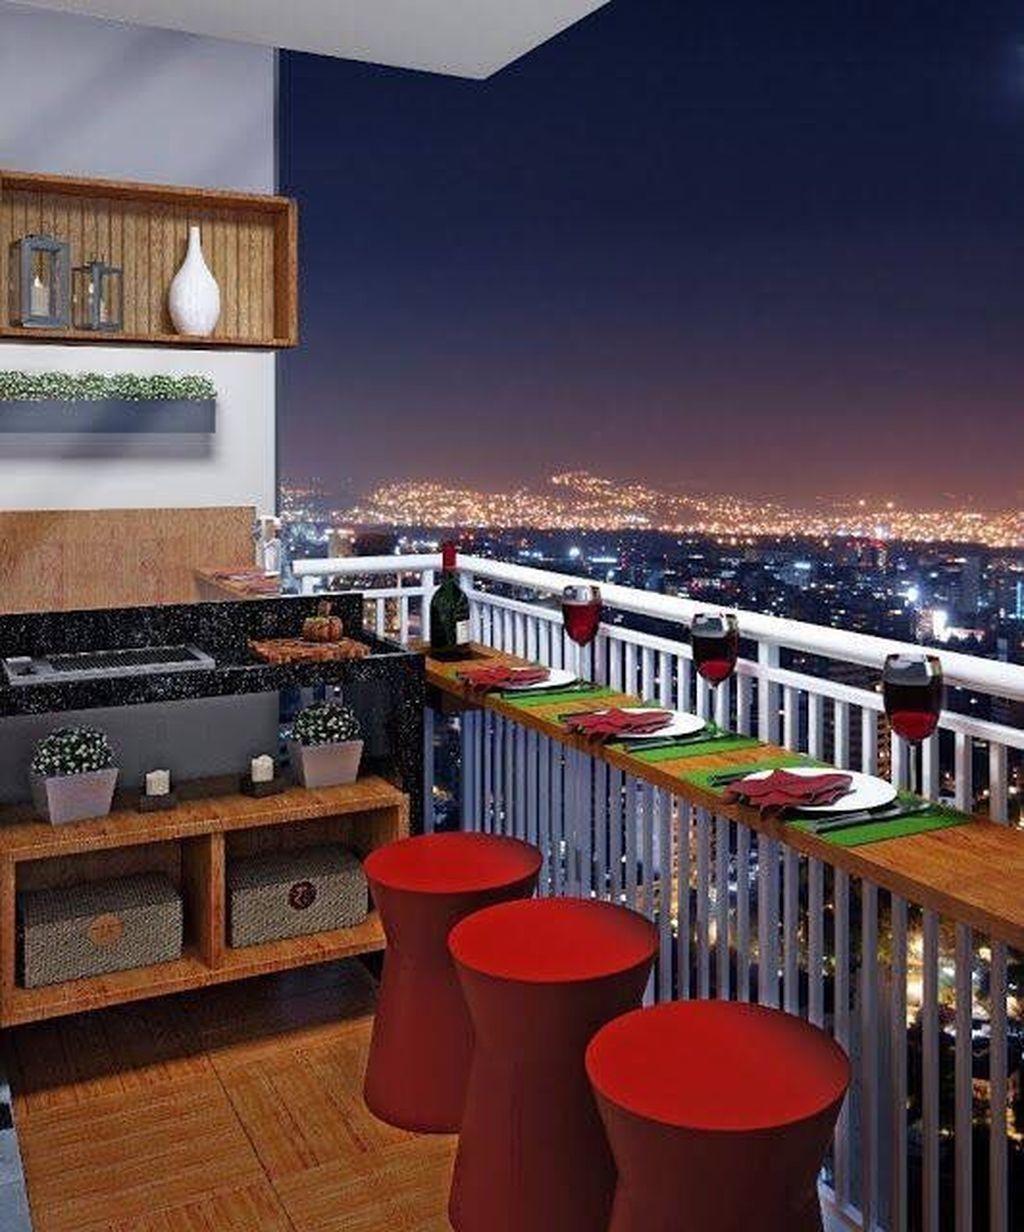 49 The Best Mini Bar Design Ideas in Balcony Apartment #balconybar